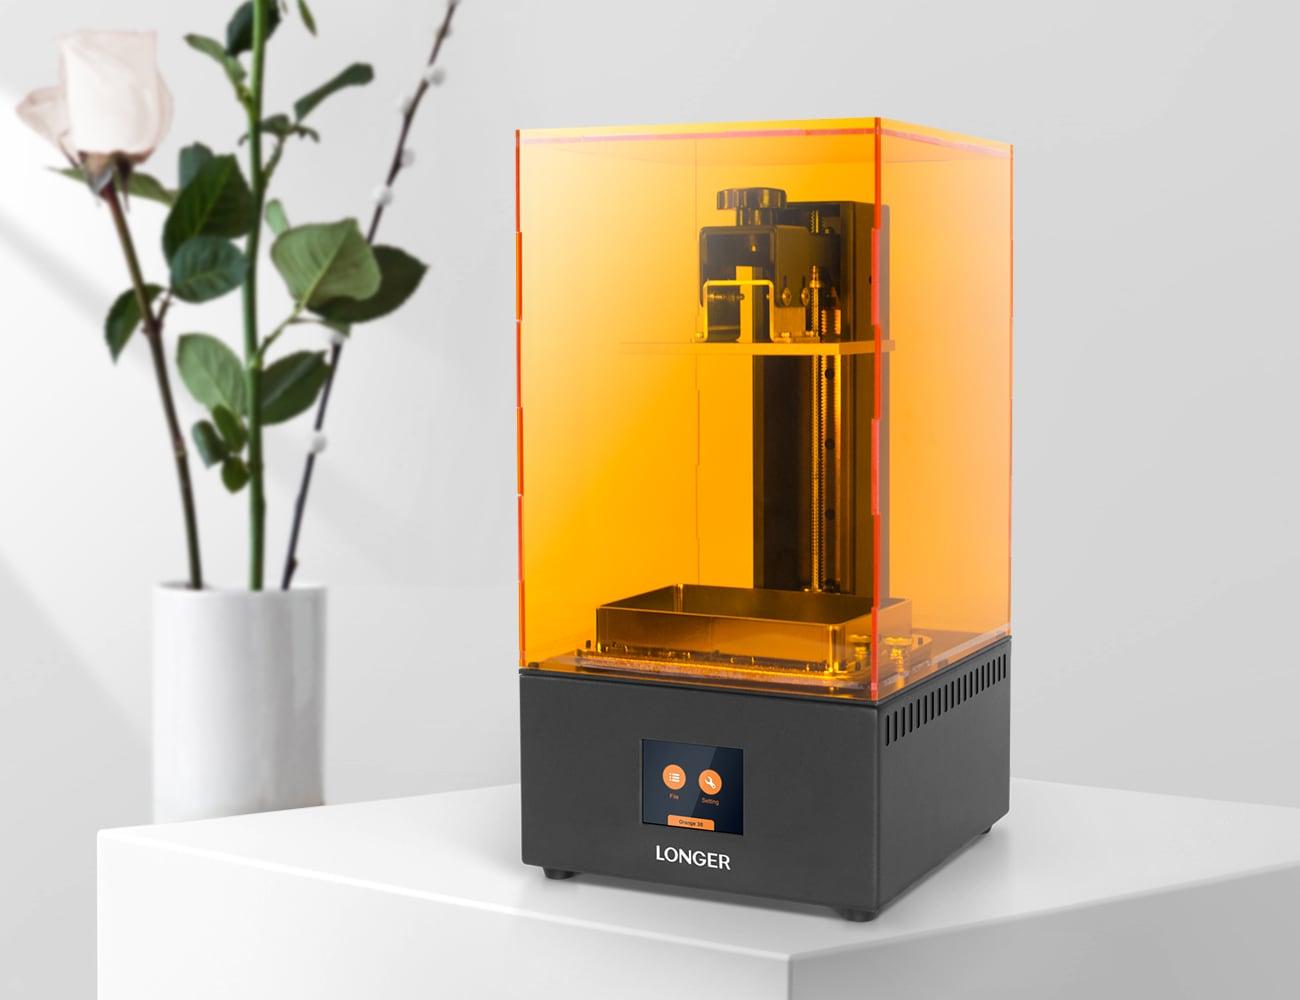 Longer Orange 30 LCD SLA 3D Printer is an affordable way to create models